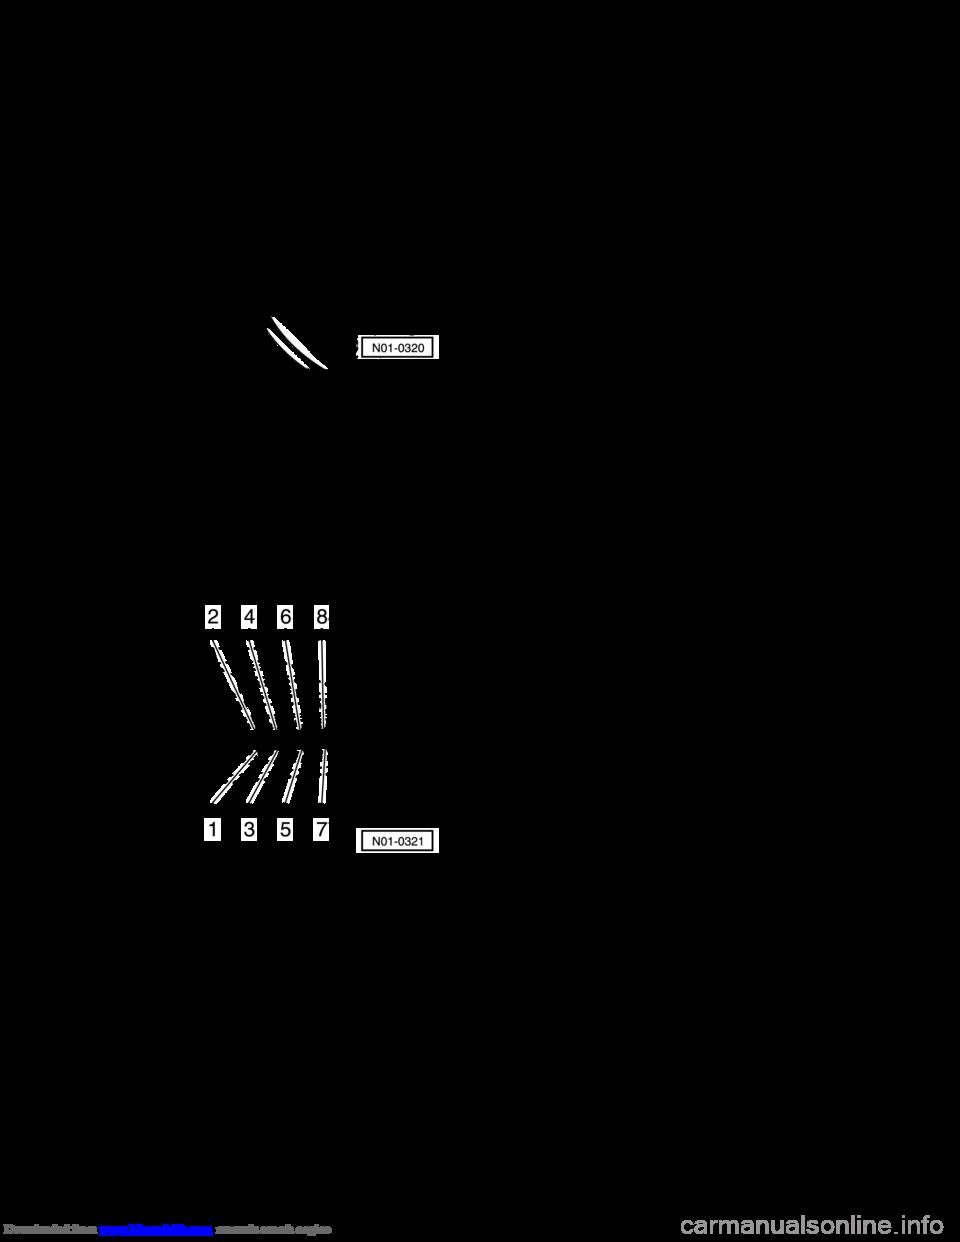 SKODA OCTAVIA 2000 1G 1U 02C Gearbox Workshop Manual – Skoda Octavia Wiring Diagram